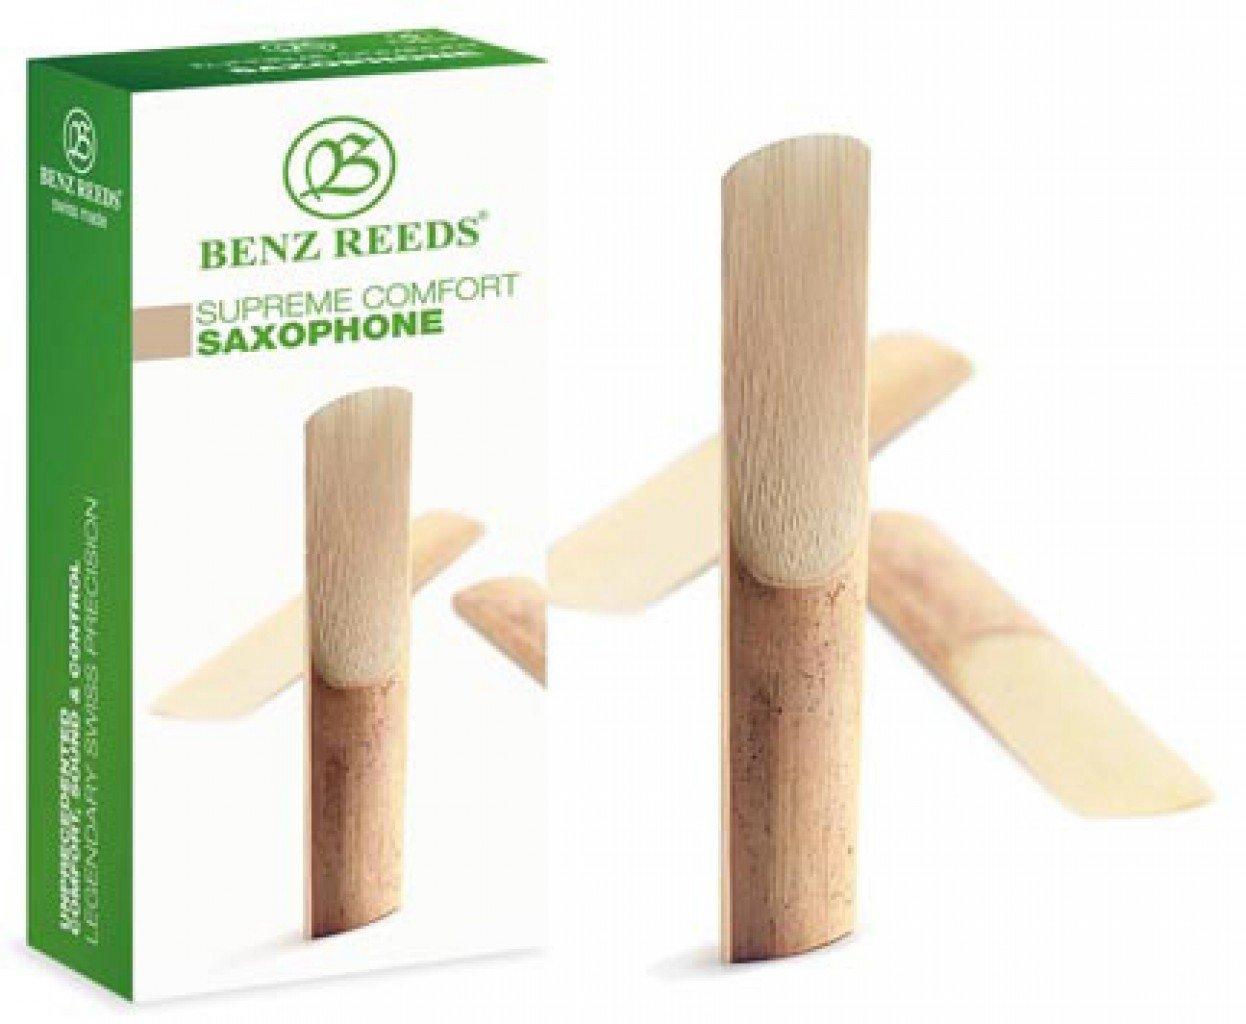 Benz Reeds BSC5ST20 Tenor Saxophone ''Comfort'' Reeds - 2.0 Strength - Pack of 5